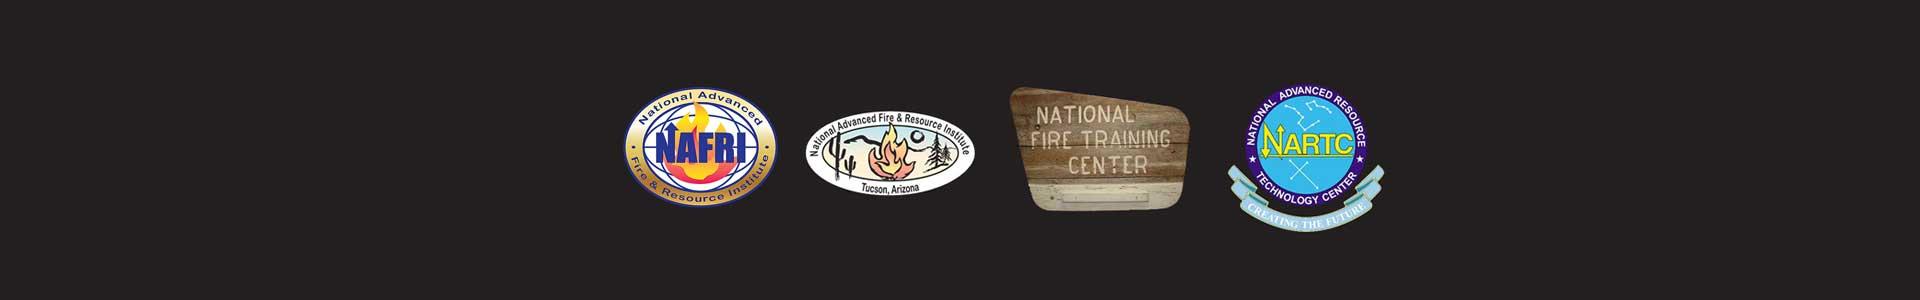 NAFRI Historical Logos